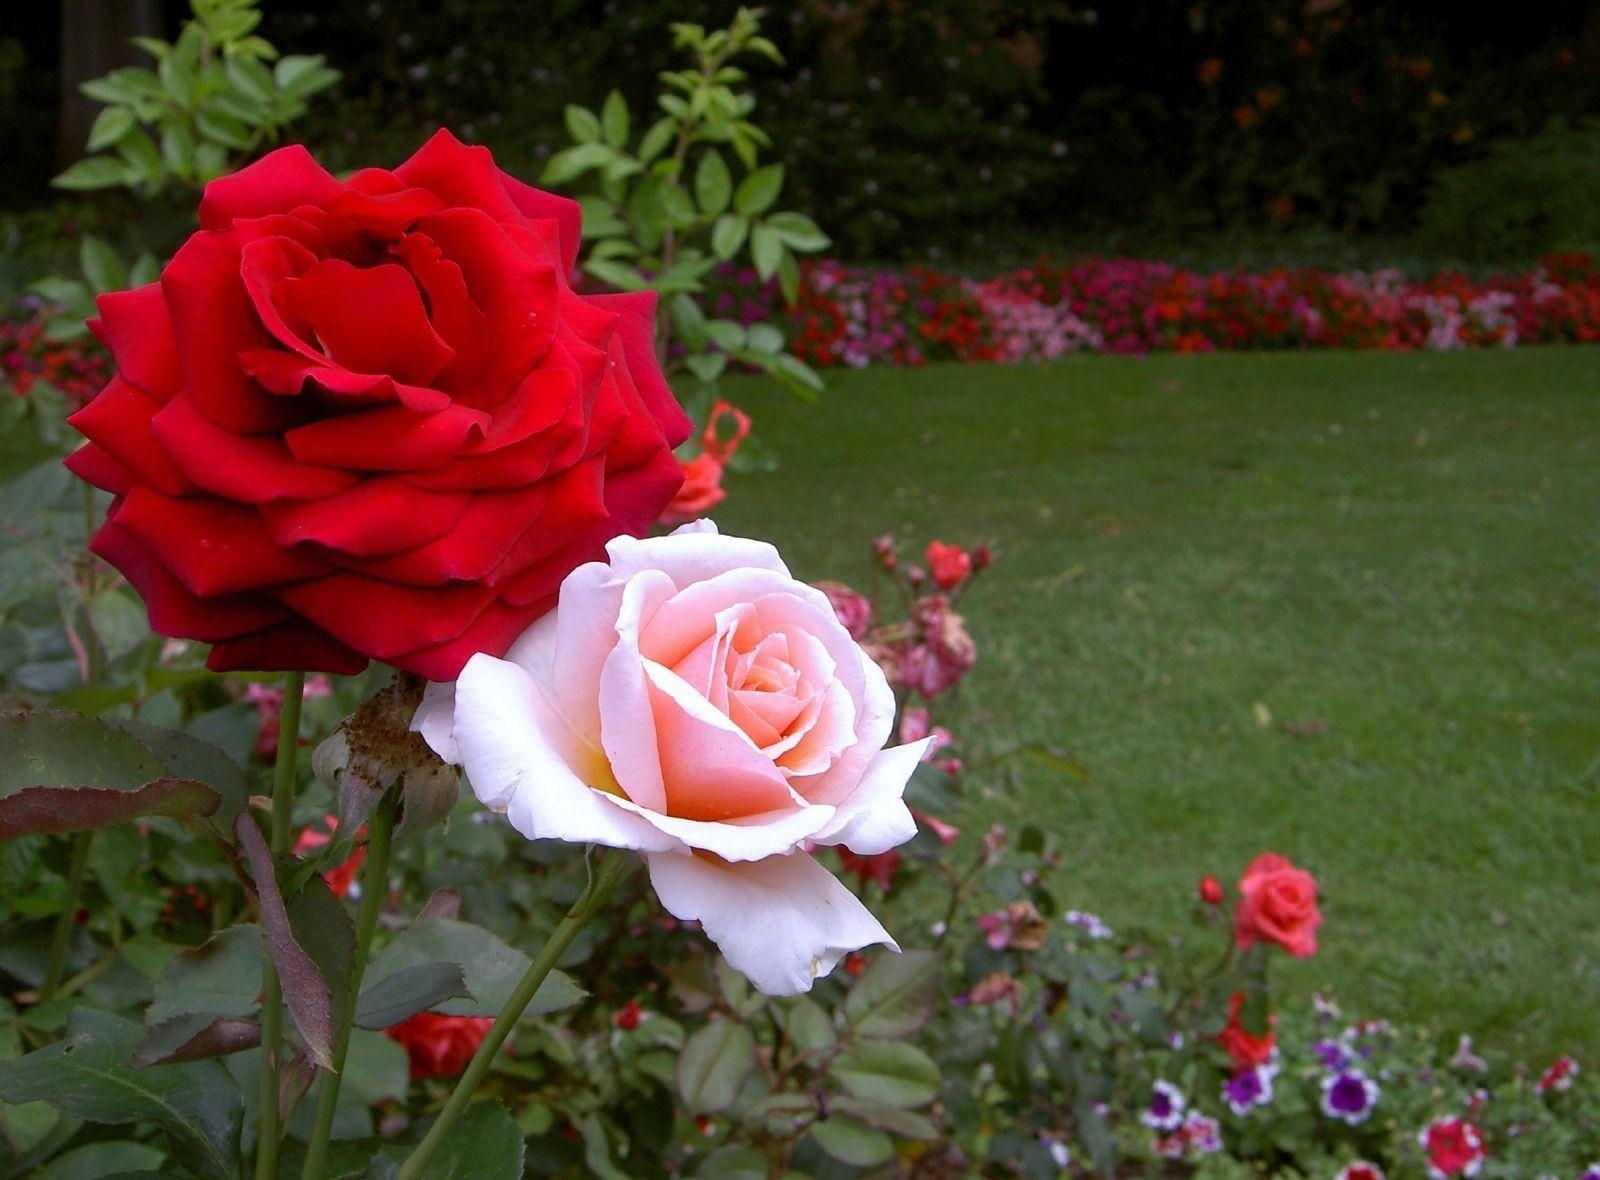 Rose Flower Garden Flower Hd Wallpapers Images